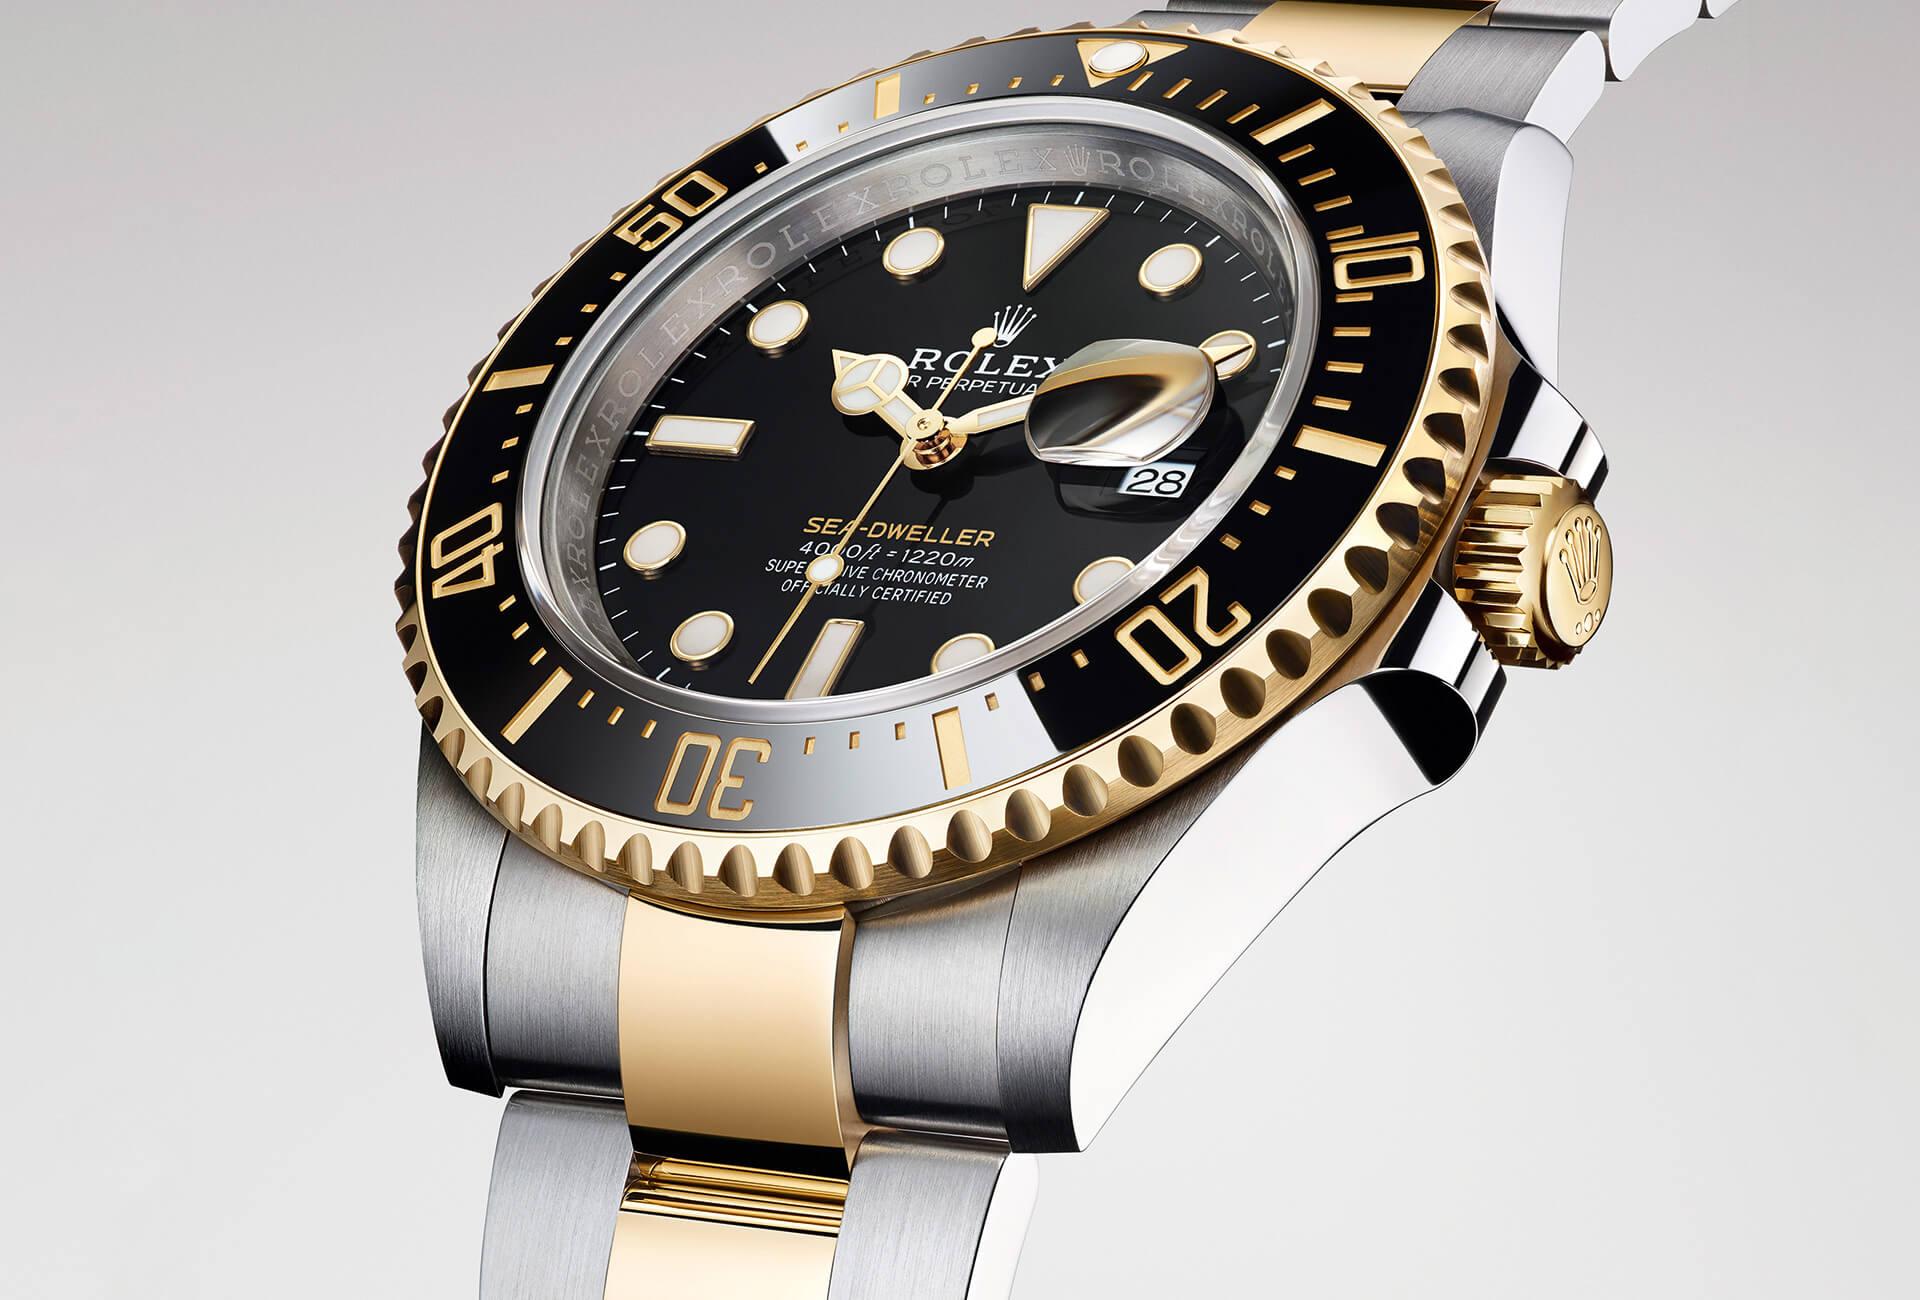 Top 6 Luxury watch brands - Rolex